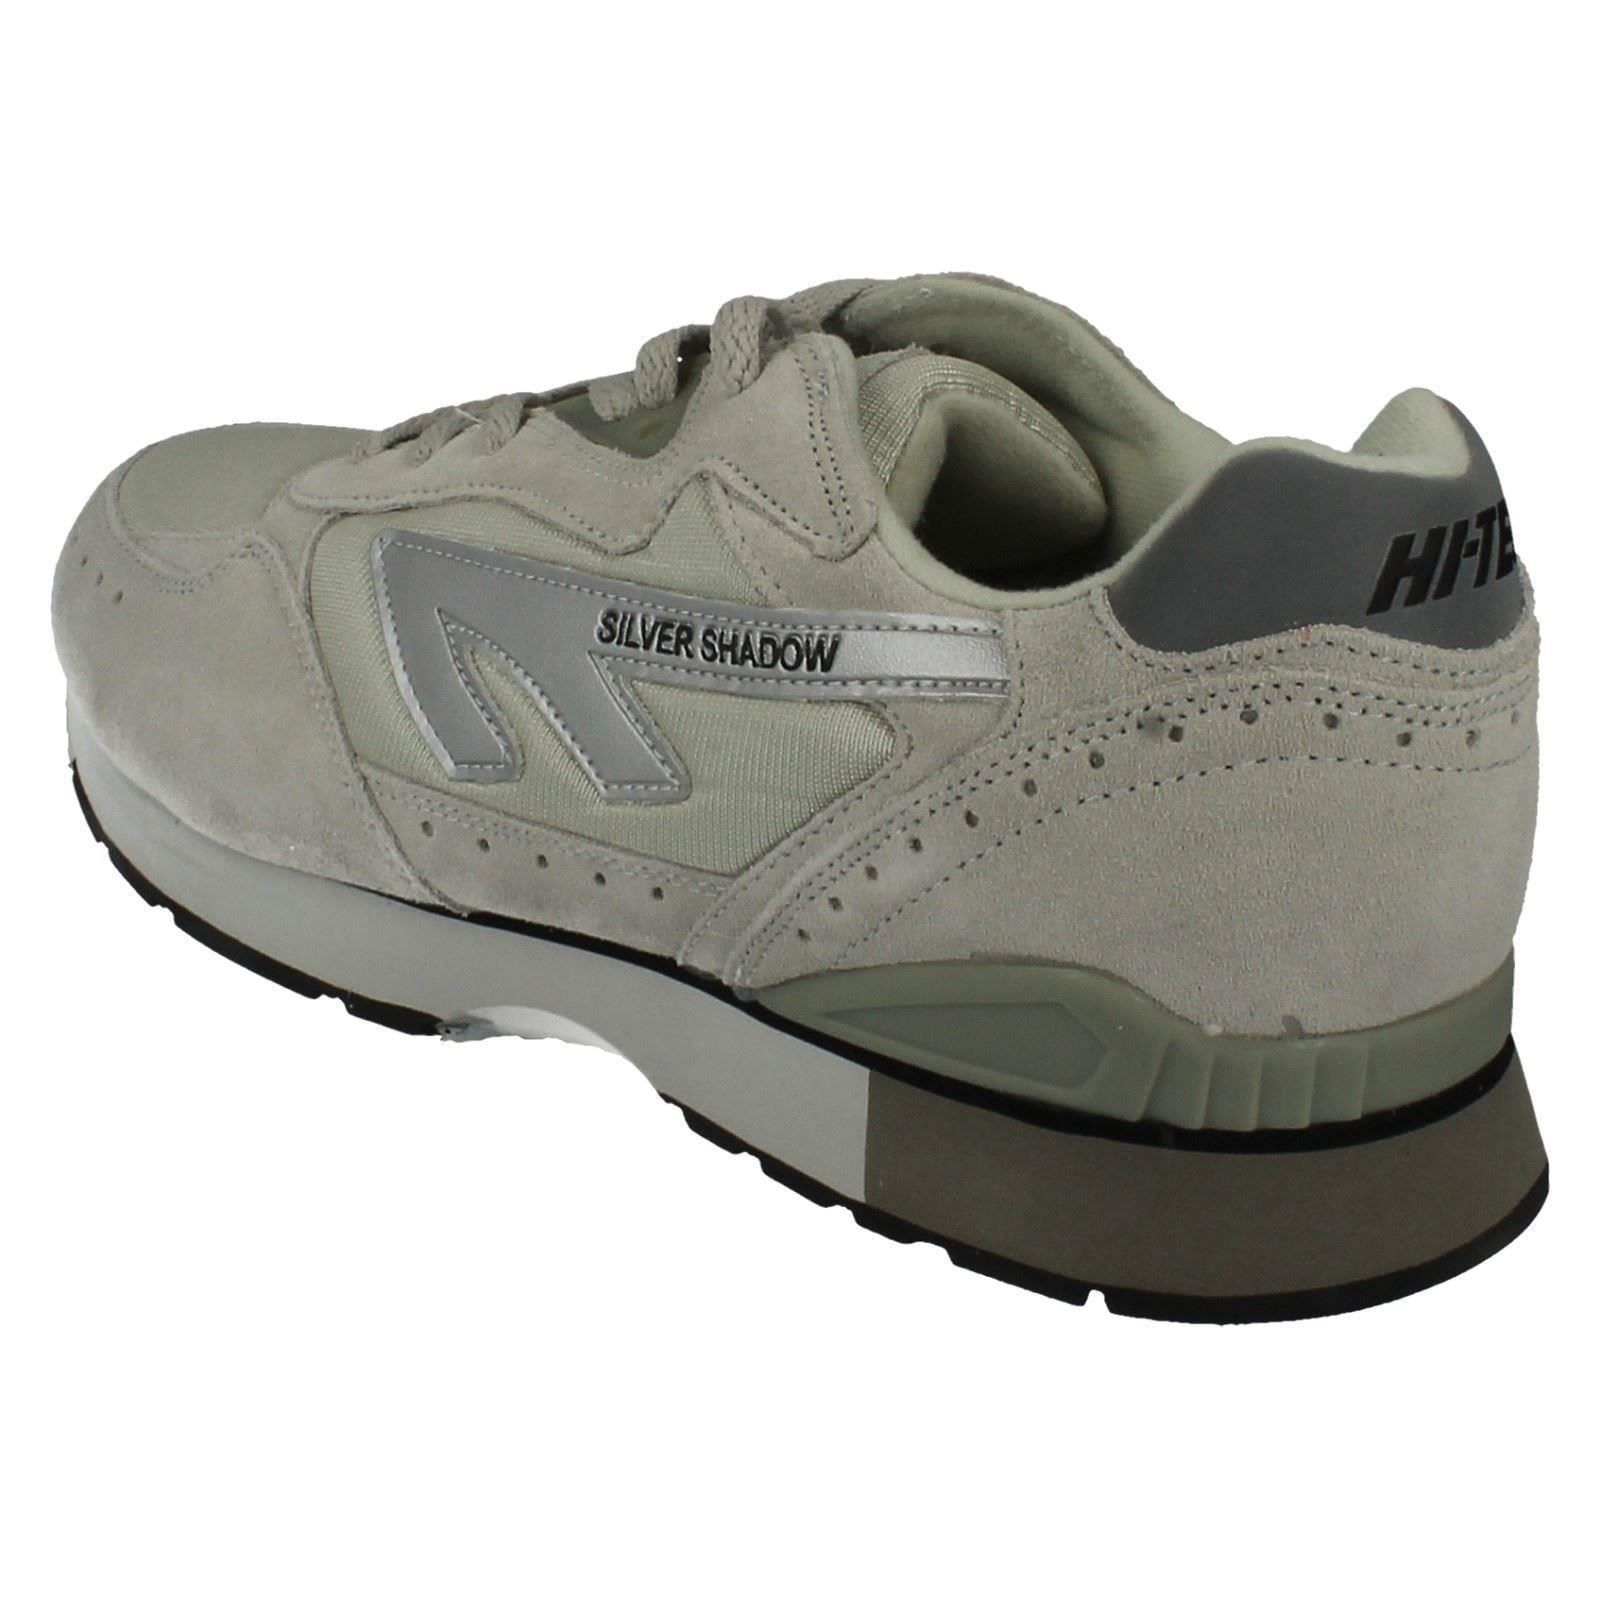 Hi Tec Silver Shadow  Mens Running Shoes